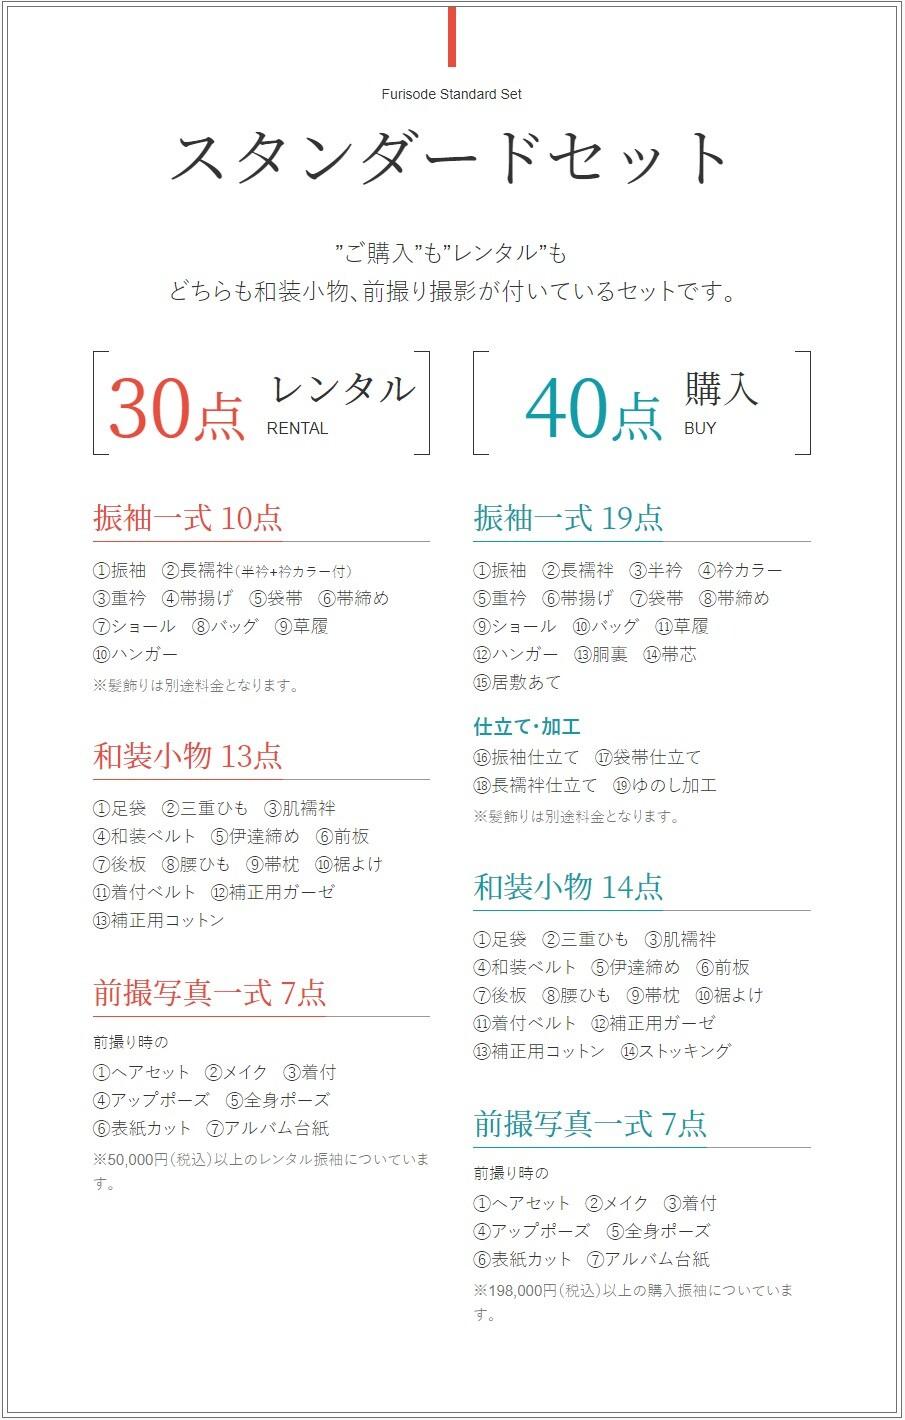 FireShot Capture 4781 - オンディーヌ各店周年祭|成人式の振袖レンタル・販売オンディーヌ - www.ondine.jp